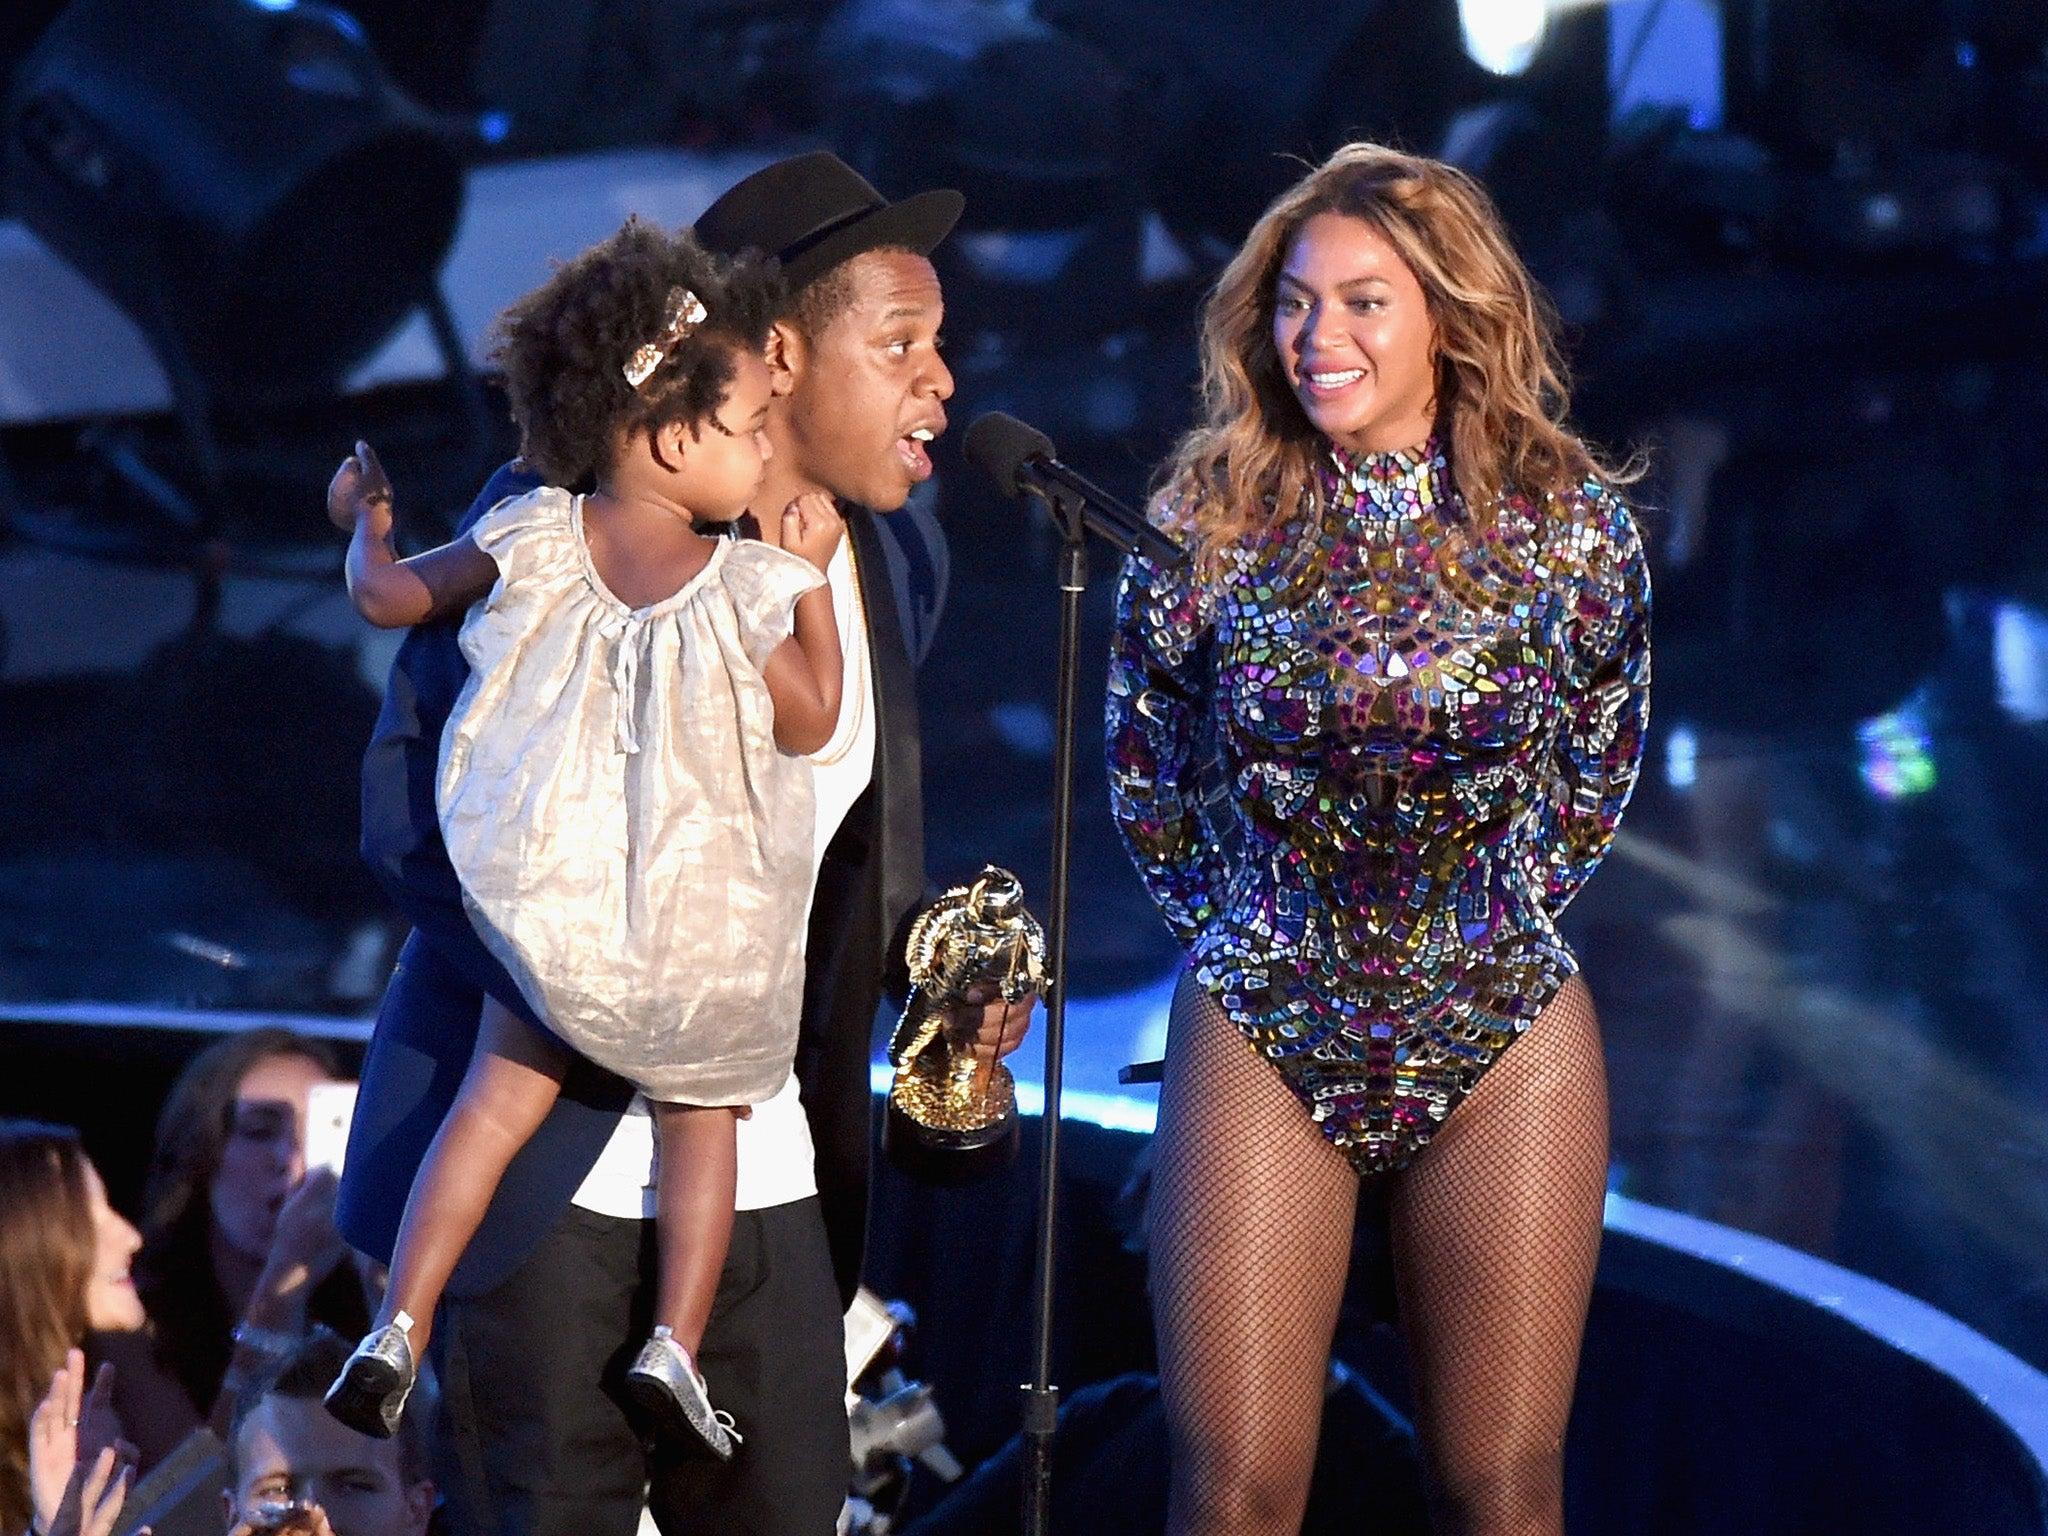 Watch Beyonce perform full album Beyoncé at MTV VMAs 2014